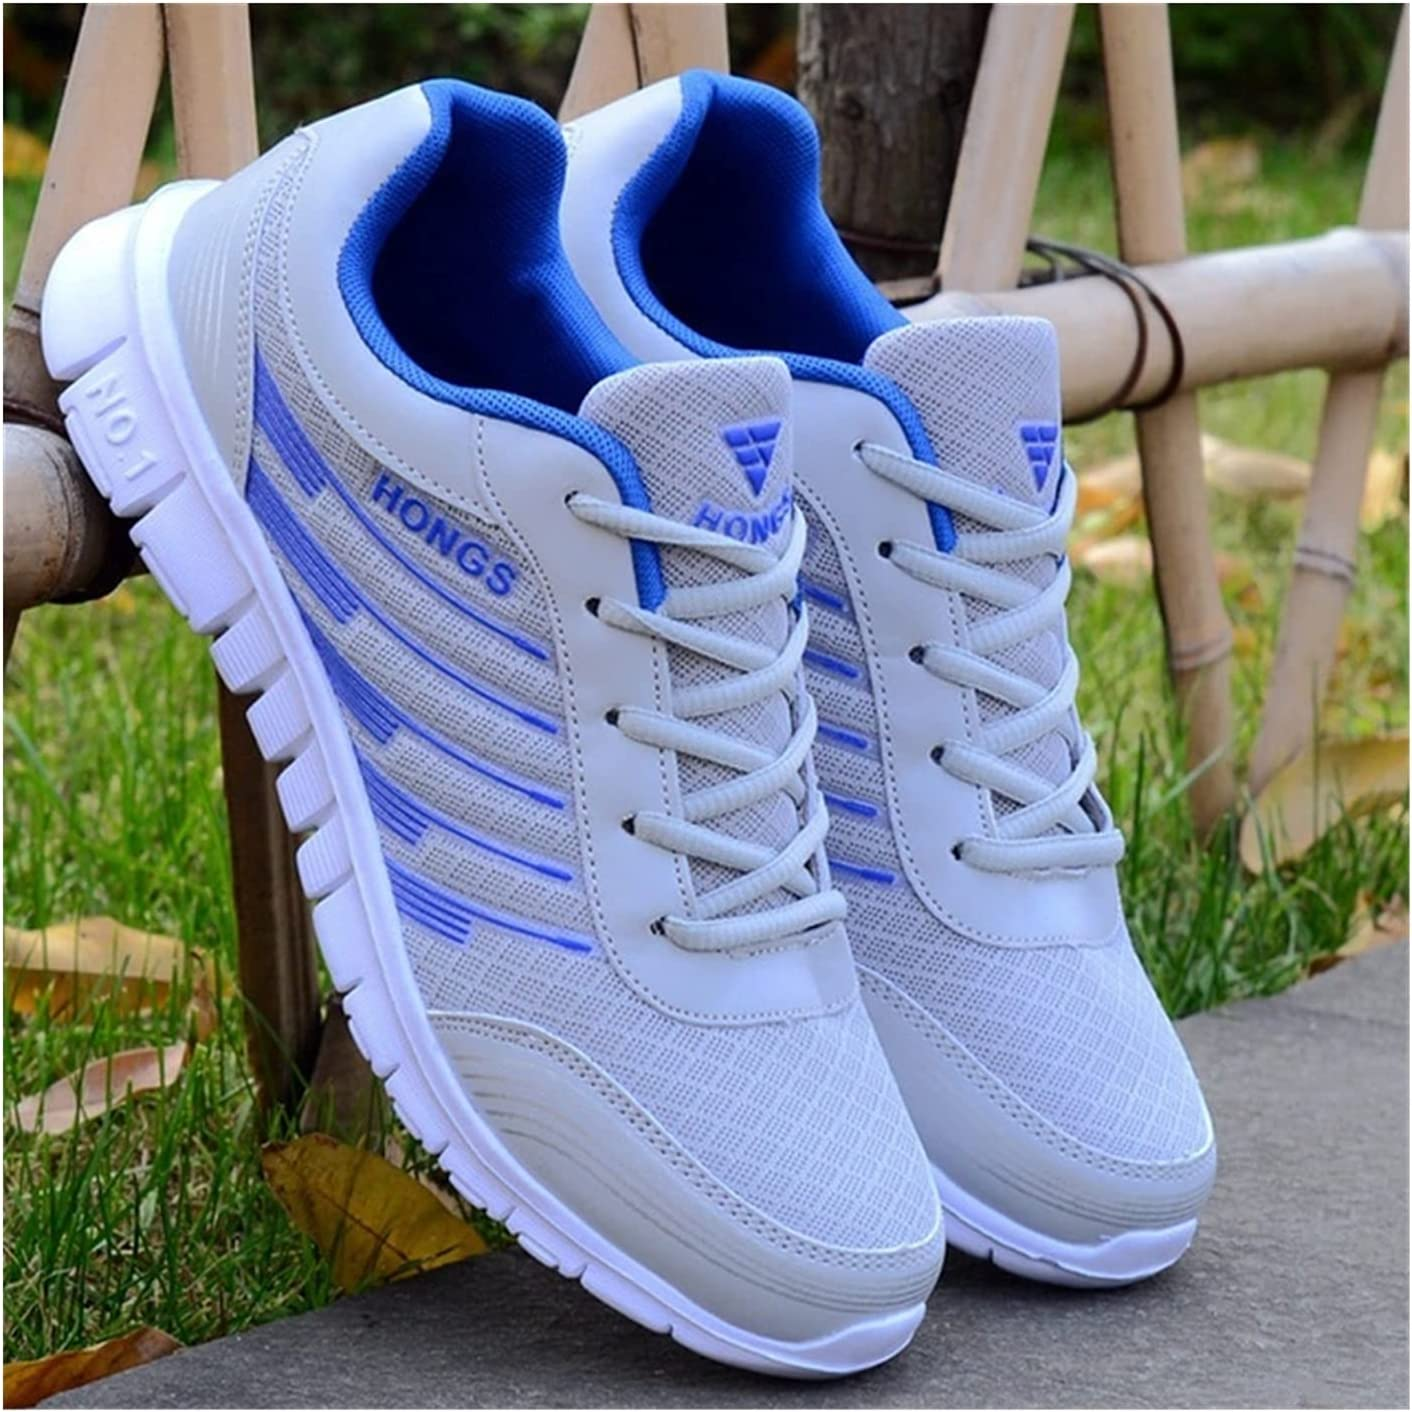 QYJPN New Sneakers Superlatite Men Now free shipping Shoes Walking Lightweight Male M